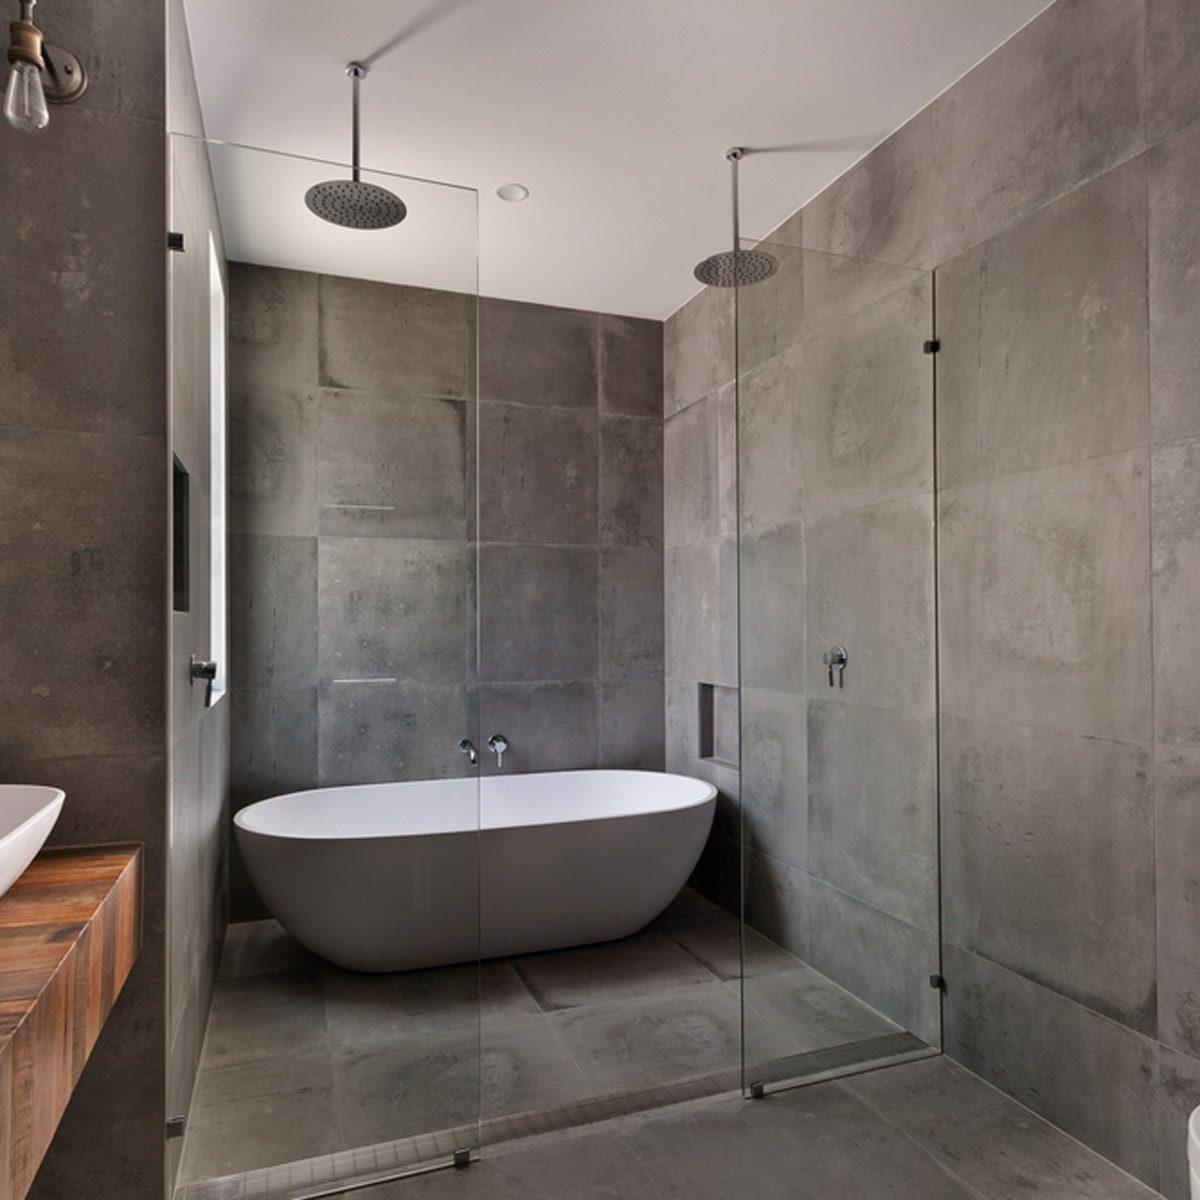 10 Genius Small Master Bathroom Ideas That Wow Family Handyman